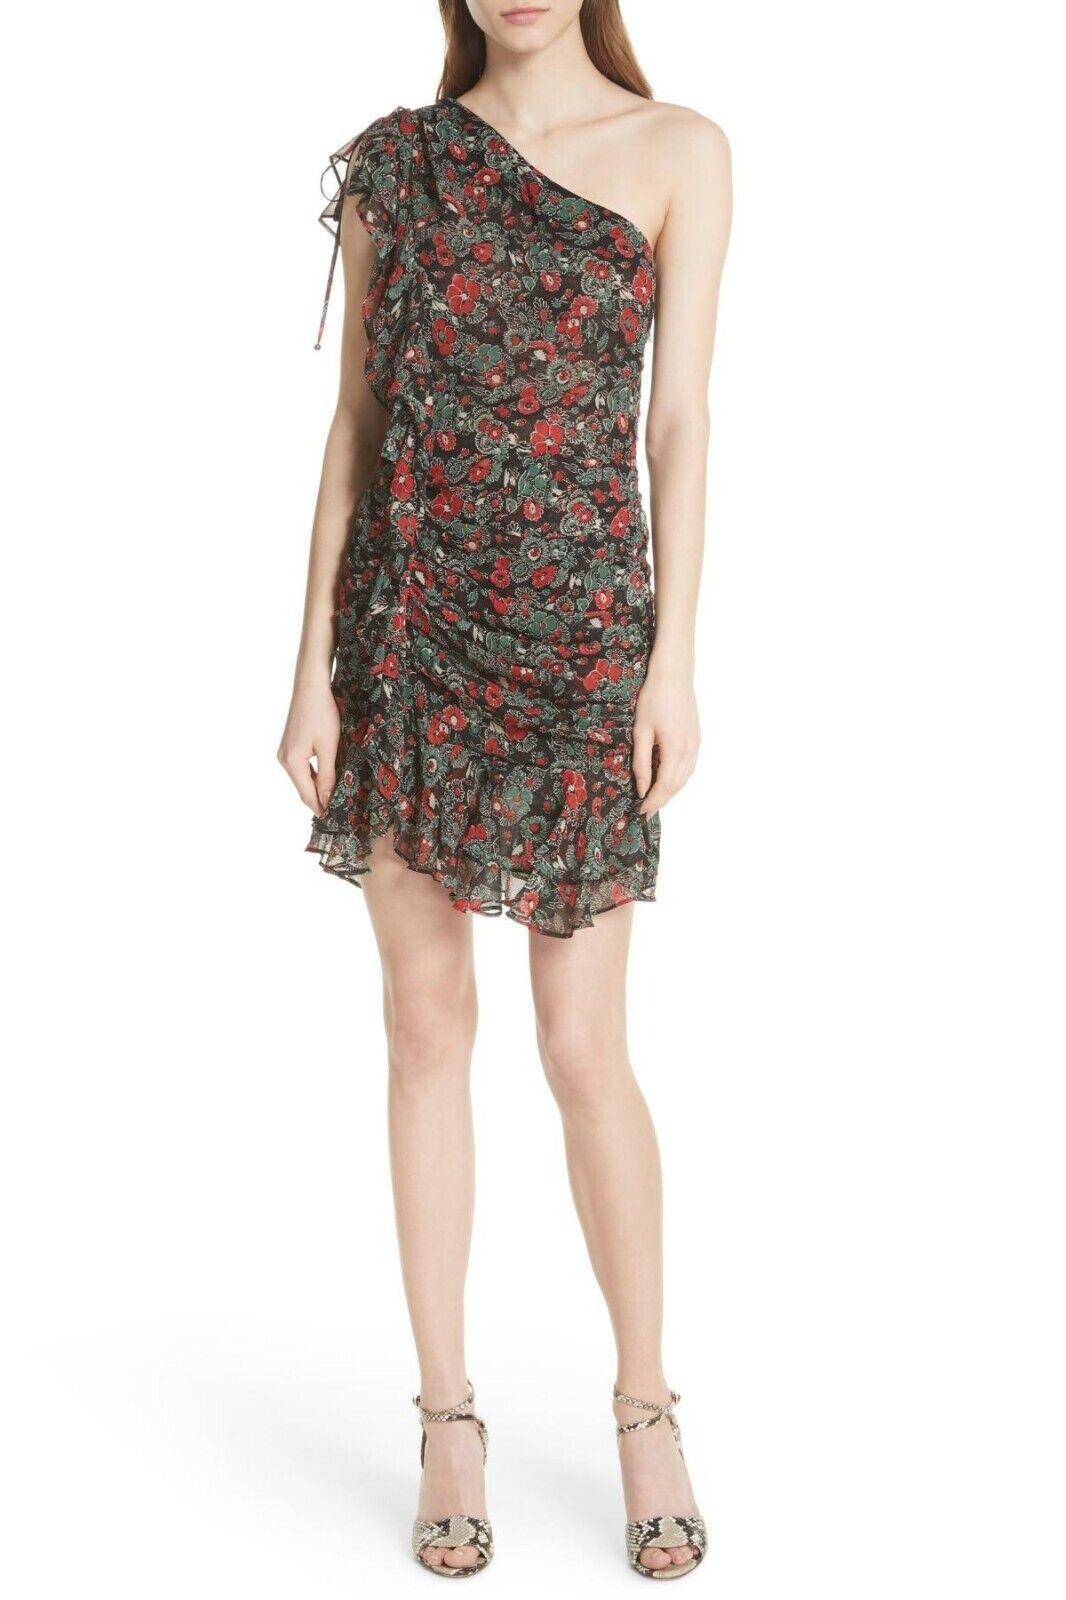 Veronica Beard Ballard Print One Shoulder Silk Dress Größe 8 Originally